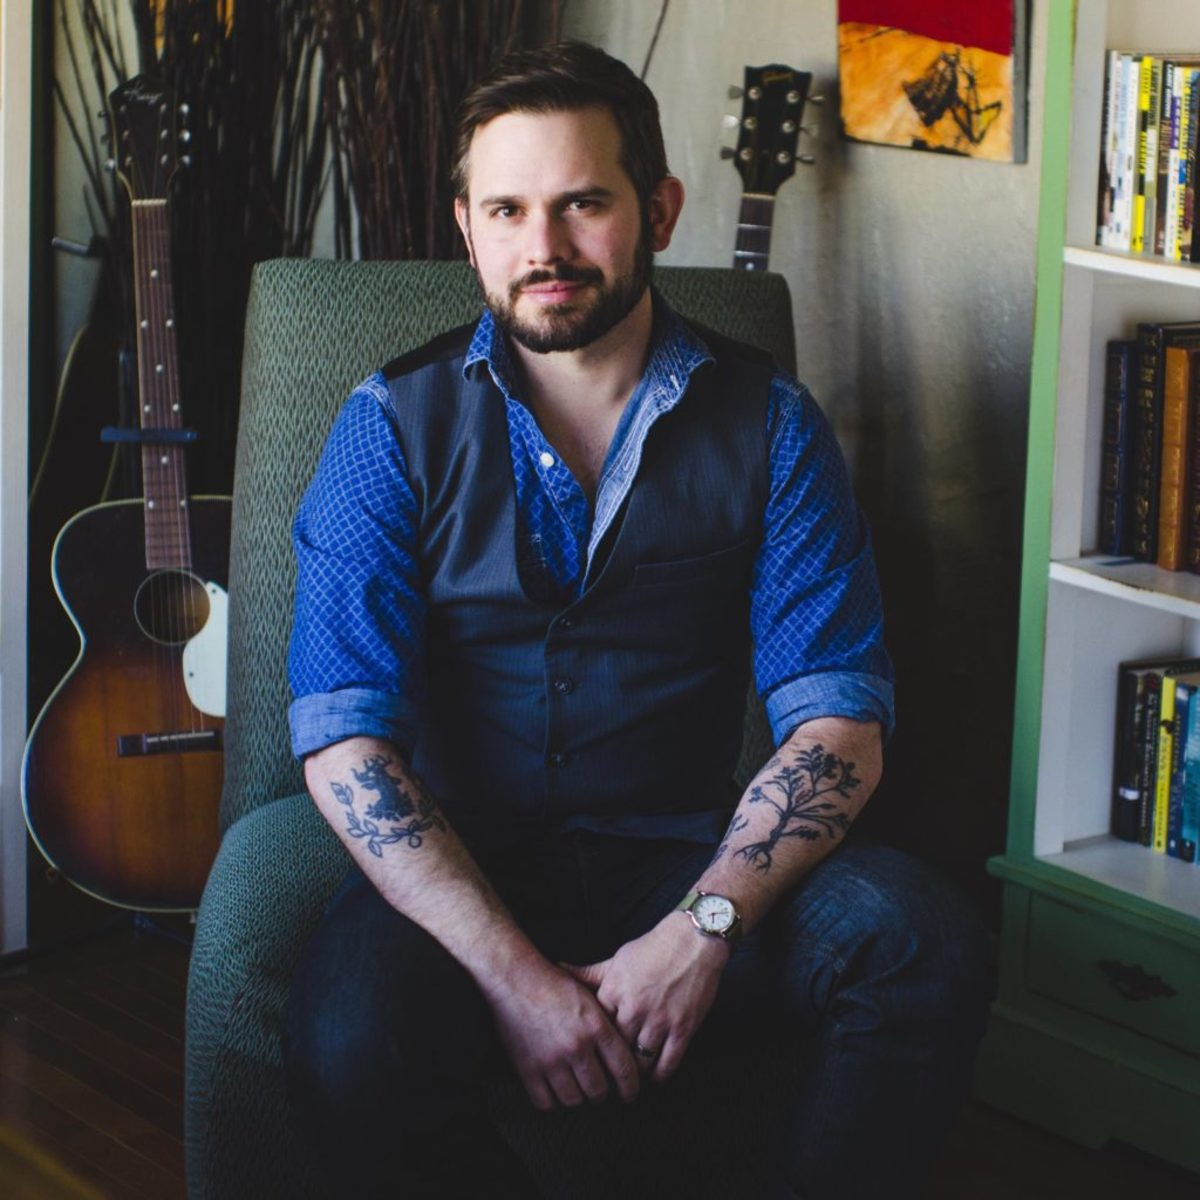 Jeff-Zentner-author-writer